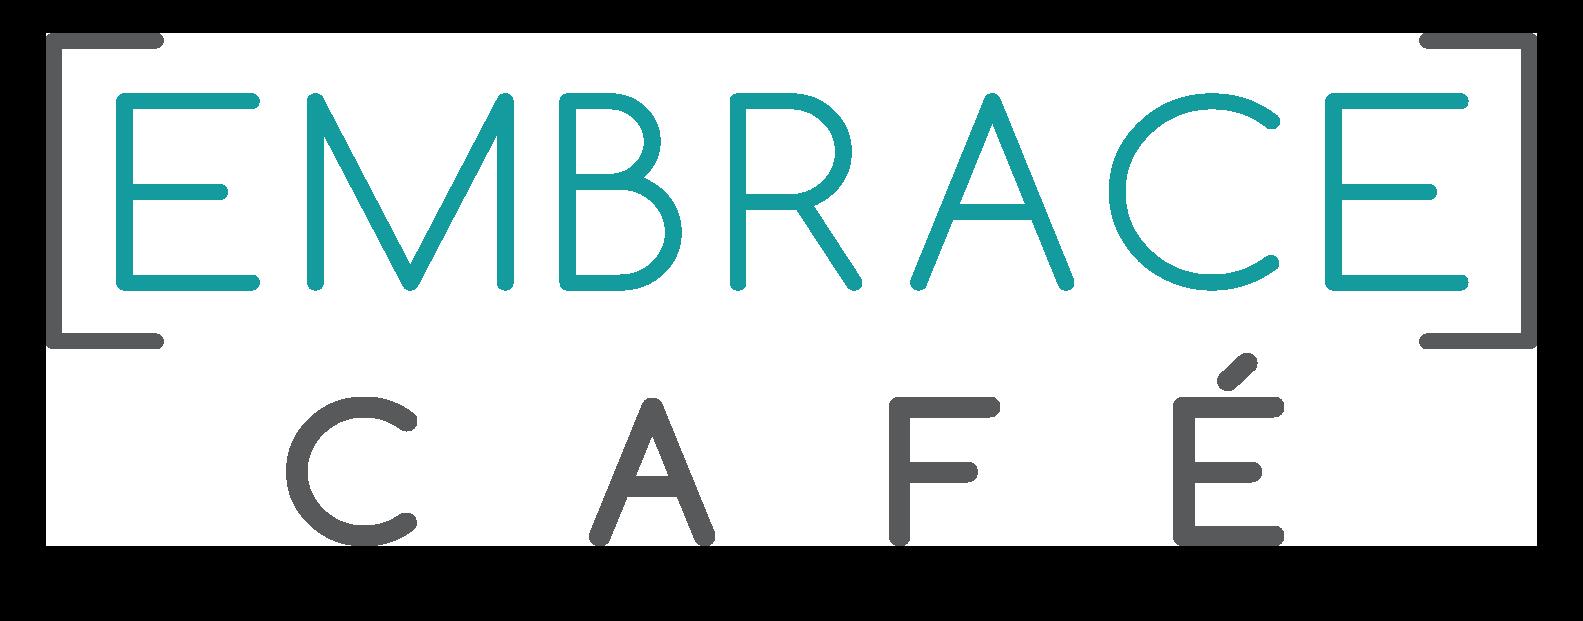 EmbraceCafe_logo lg.png